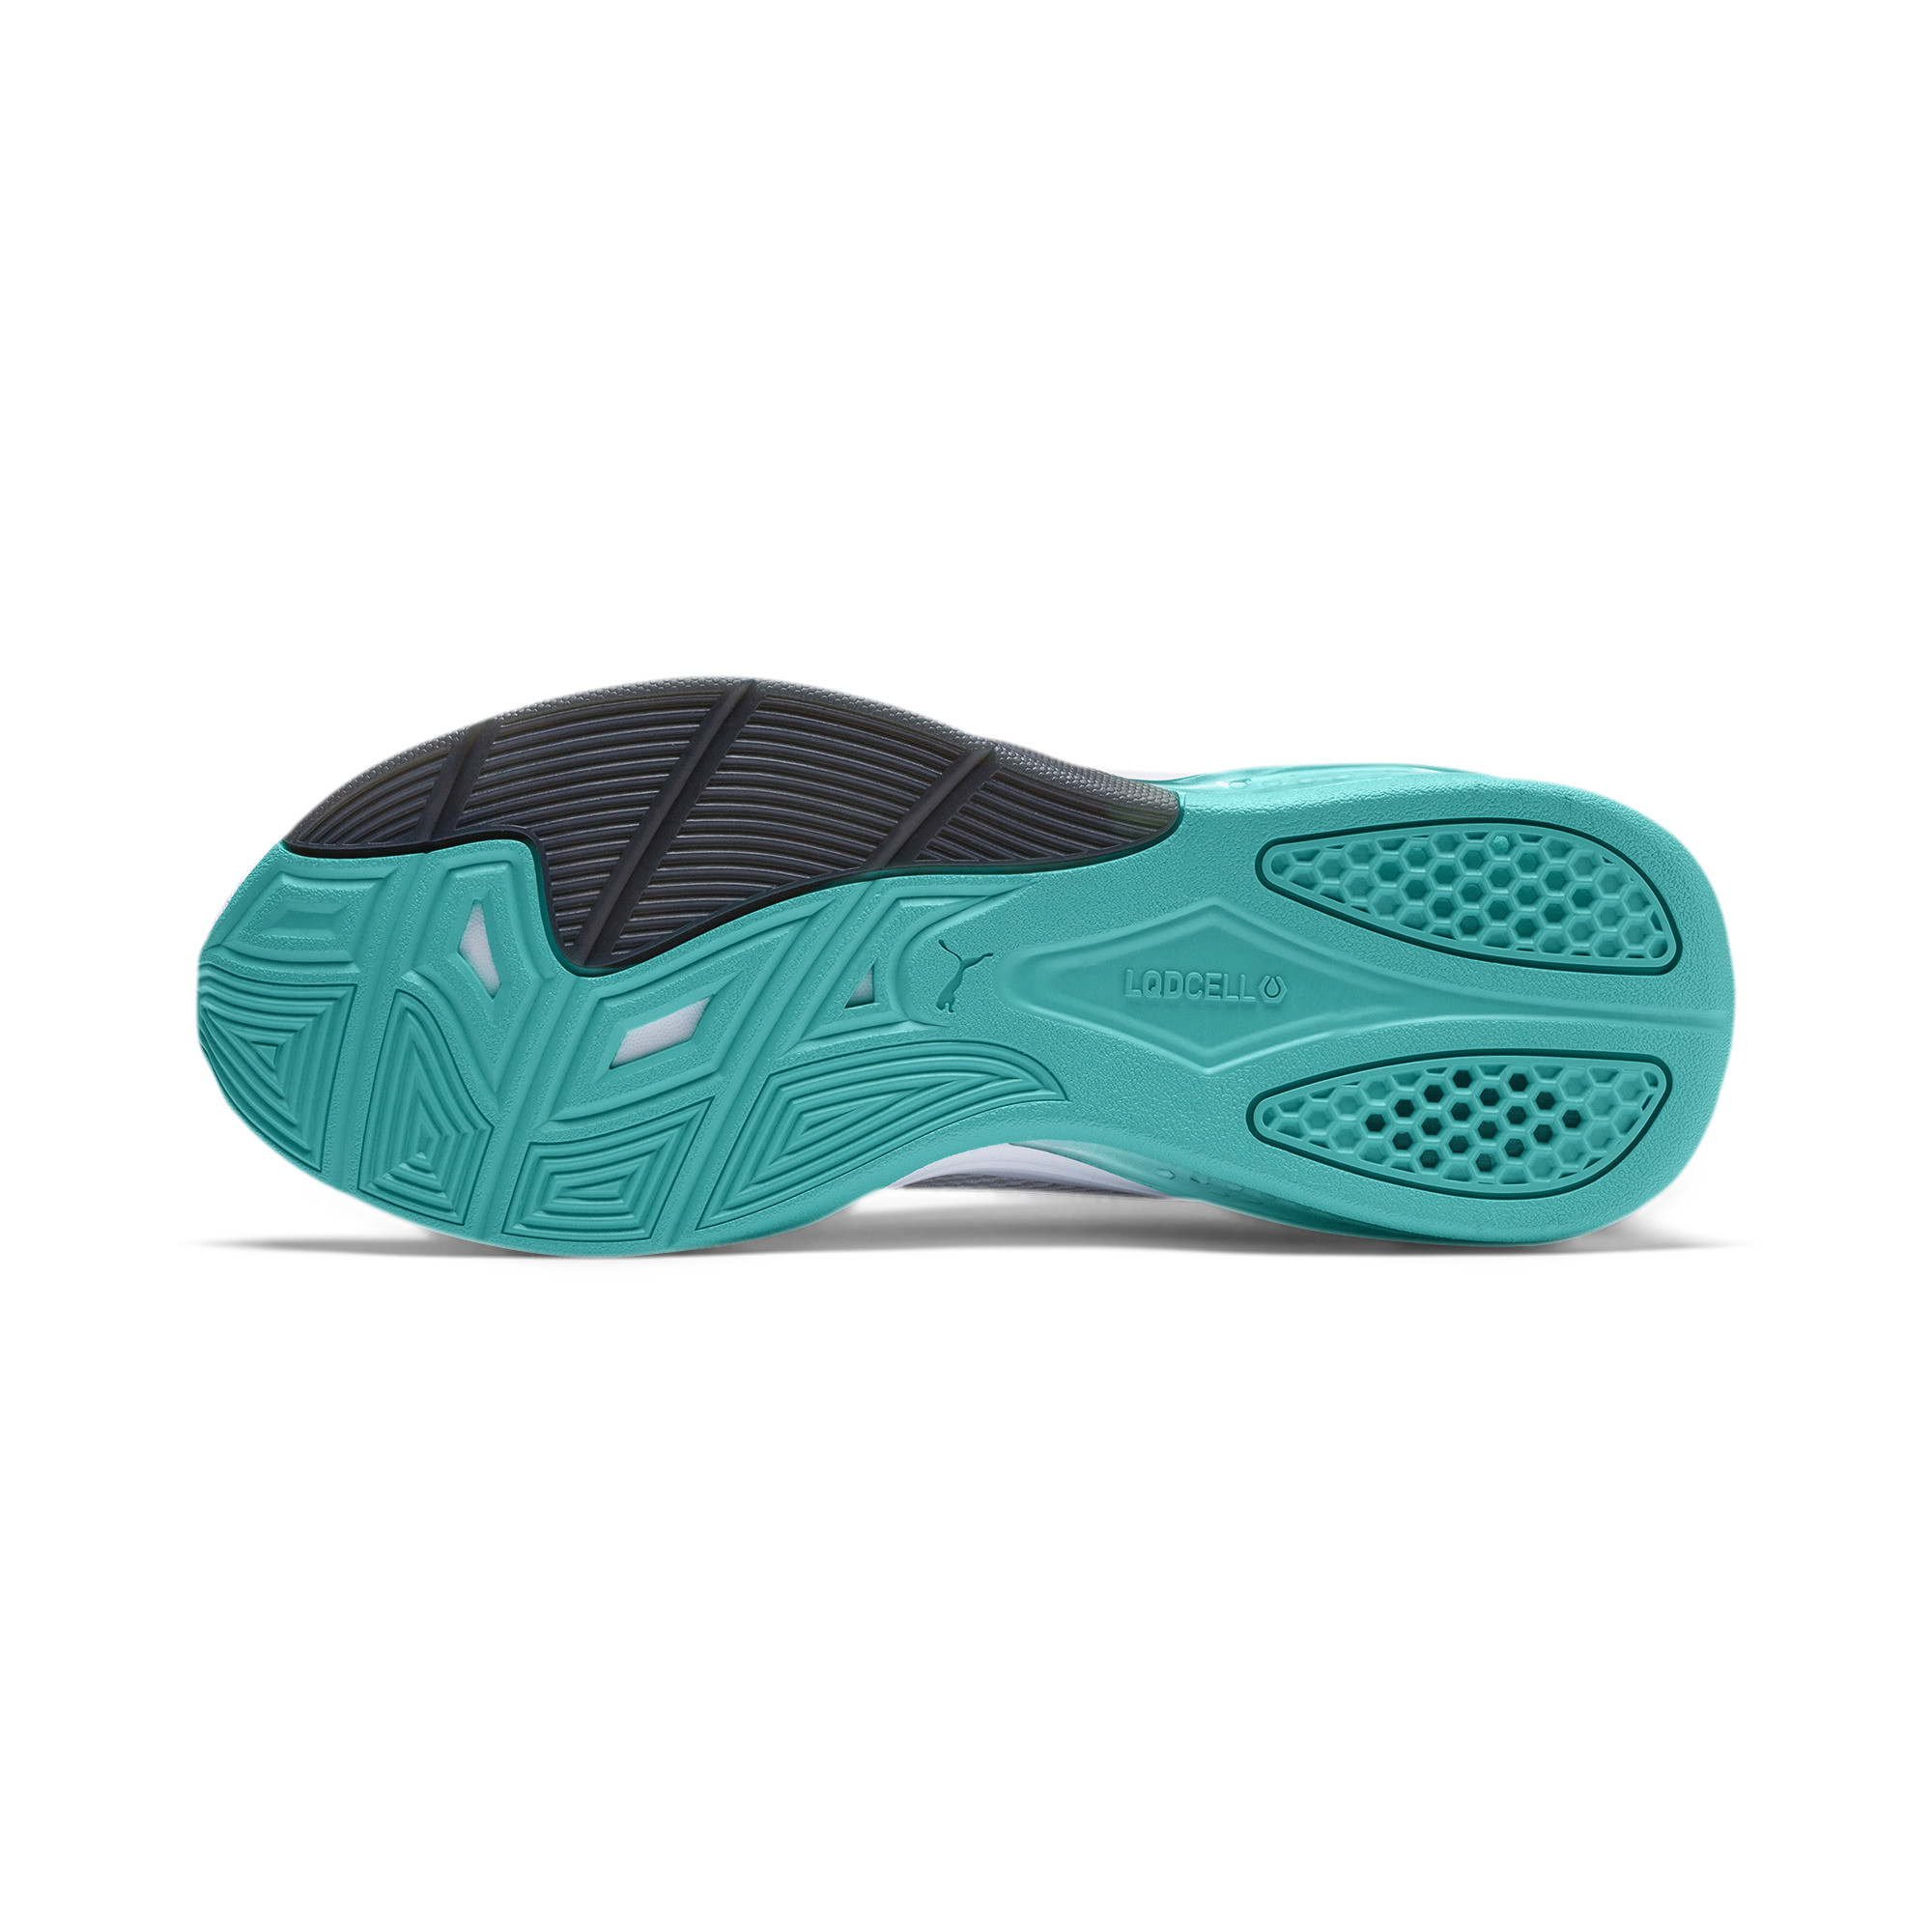 PUMA-LQDCELL-Tension-Men-039-s-Training-Shoes-Men-Shoe-Training thumbnail 6